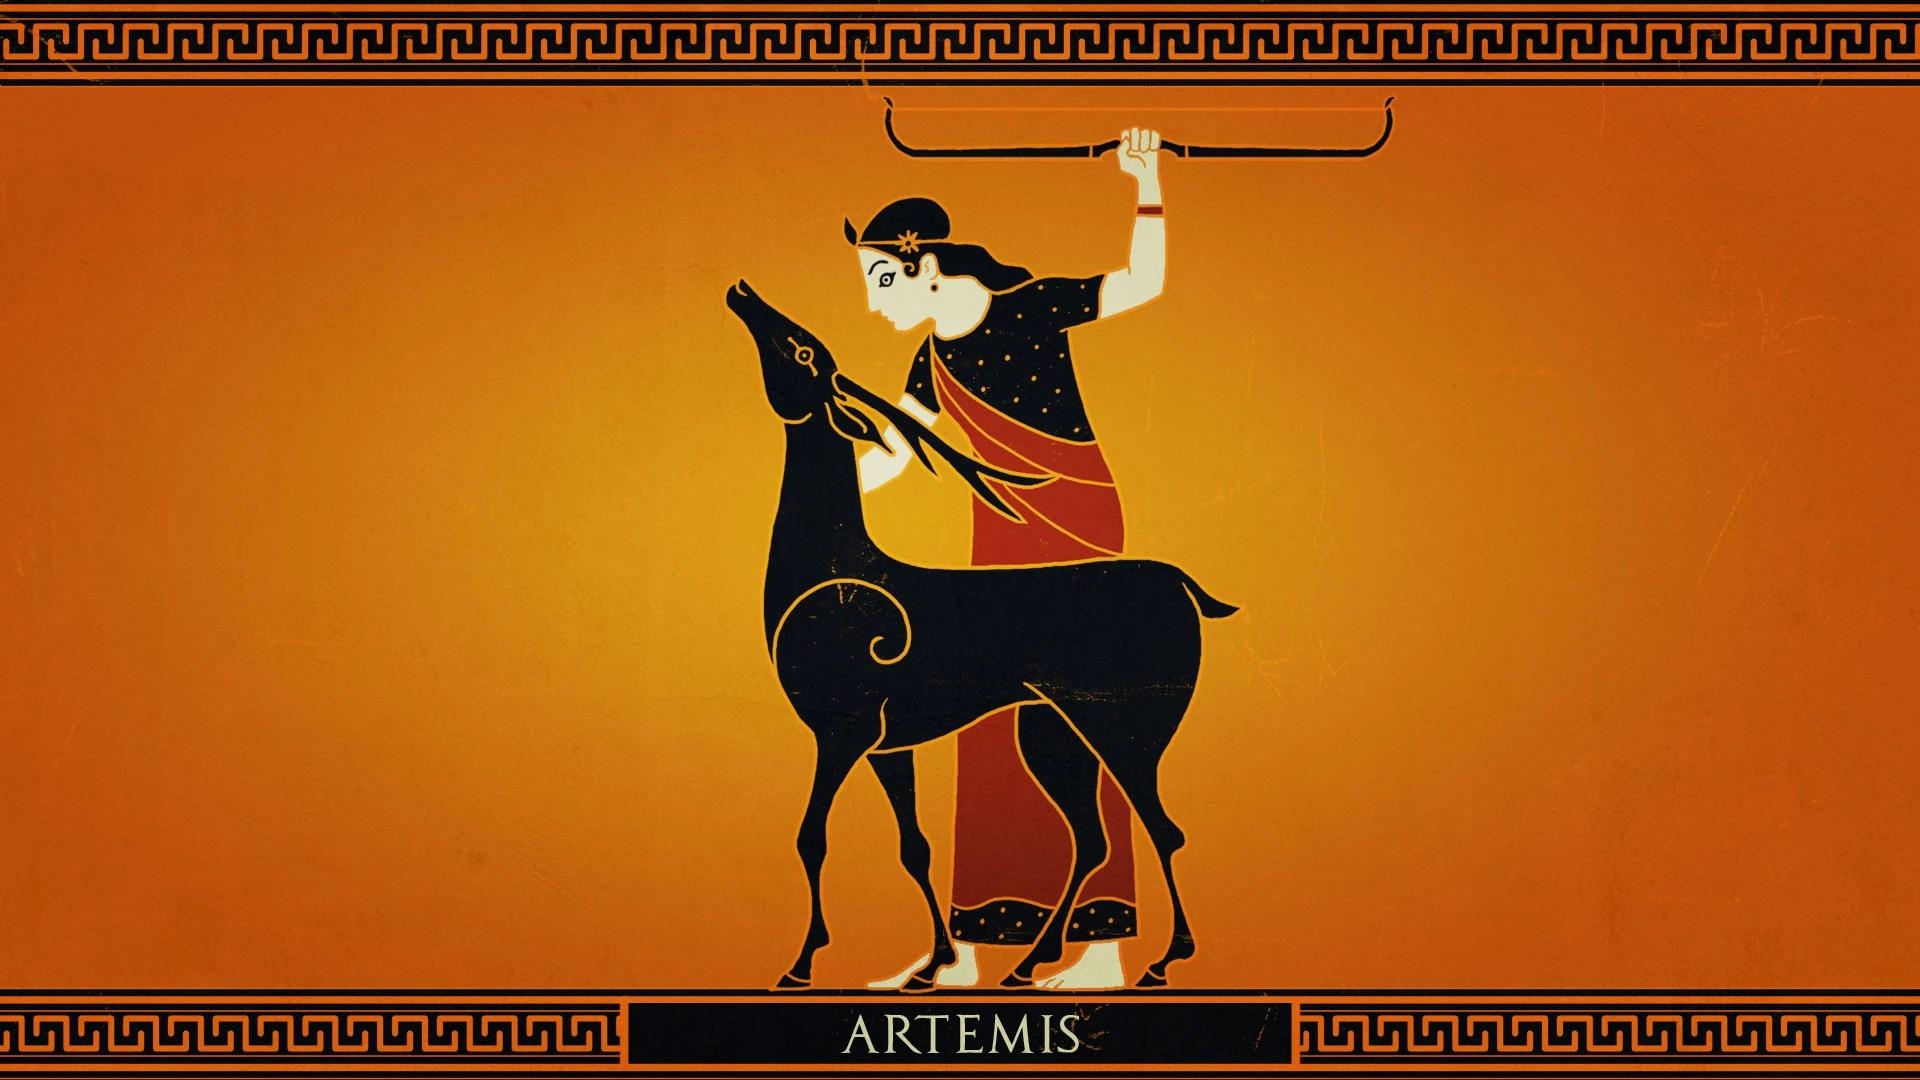 Monster University Wallpaper Hd Apotheon Artemis Steam Trading Cards Wiki Fandom